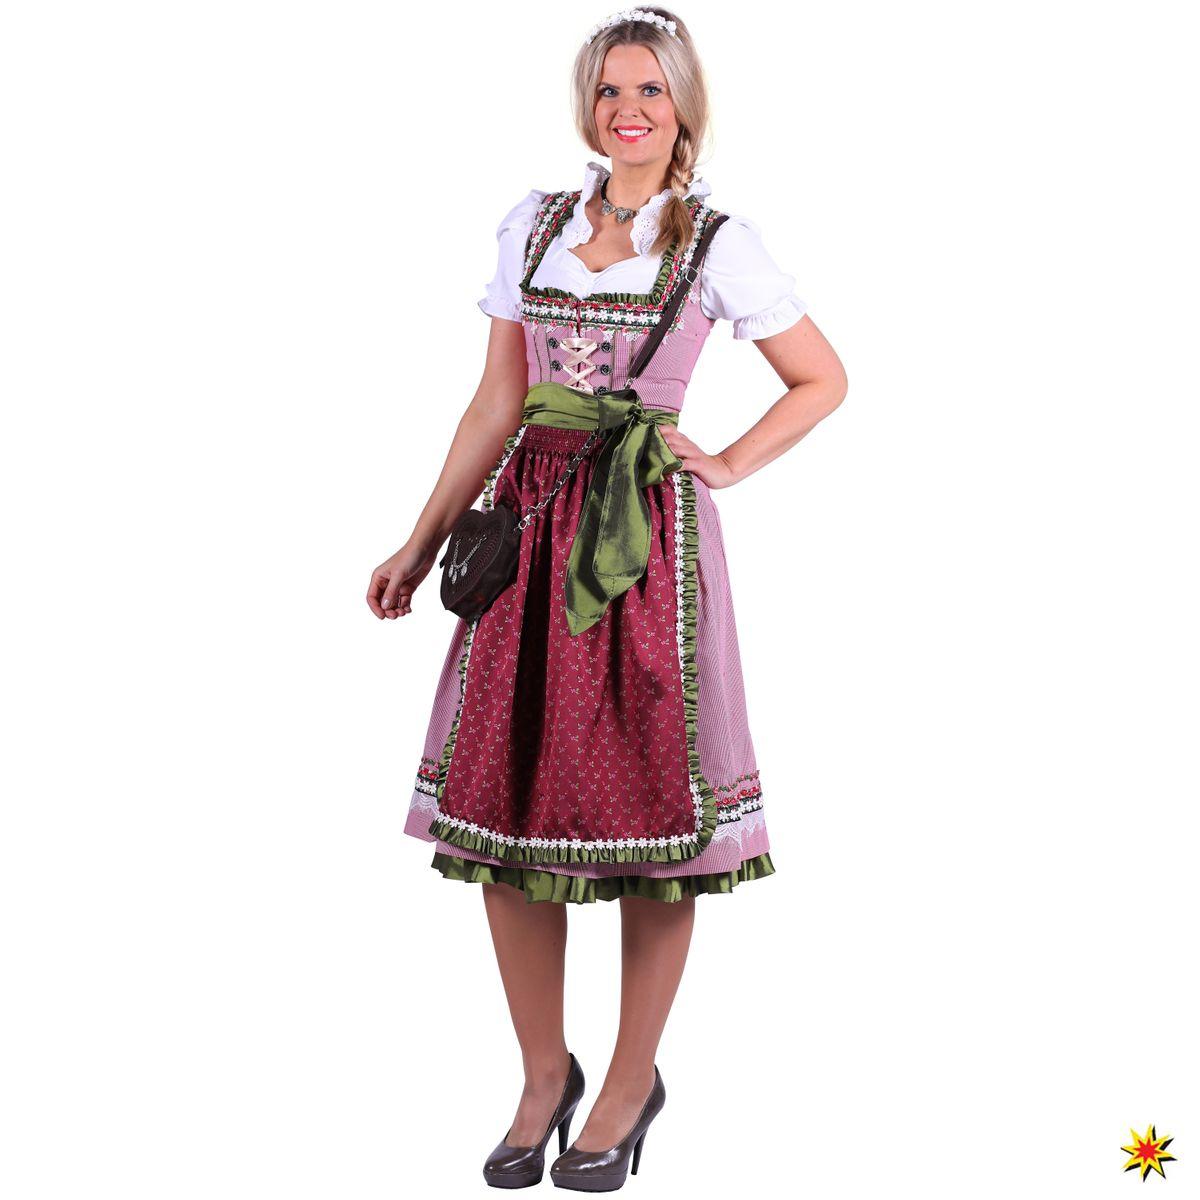 Damen Kostüm Trachtenkleid Dirndl Nora deluxe Oktoberfest Wiesn Karneval af5612bd99